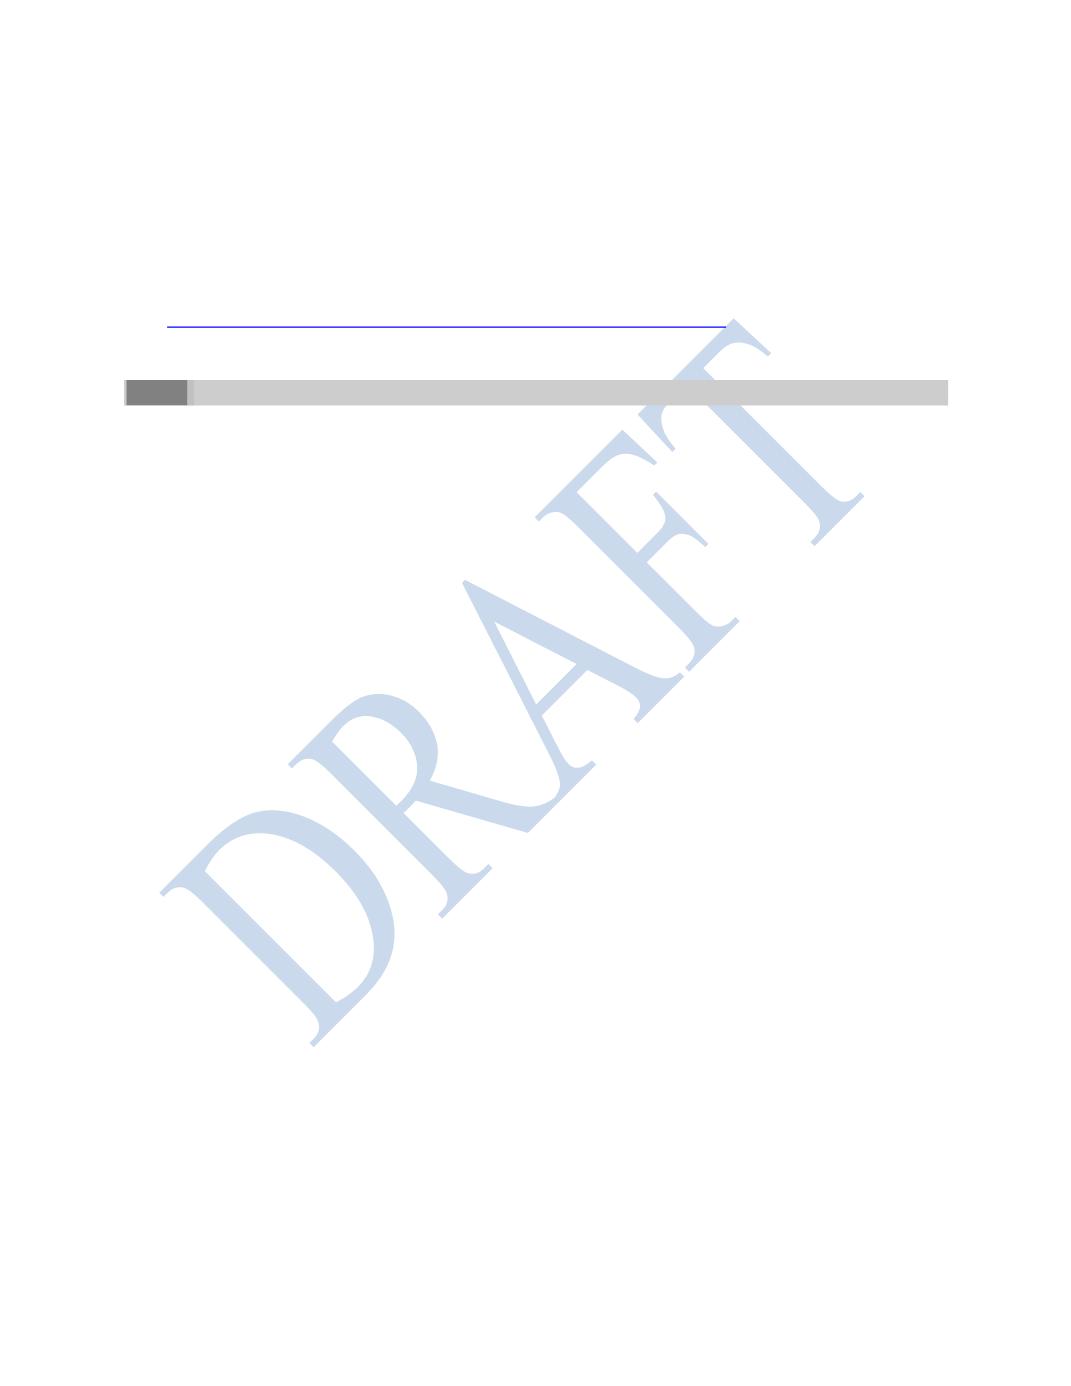 UPR003526-15 Manual 2942.0 SHSM Vol I DRAFT master